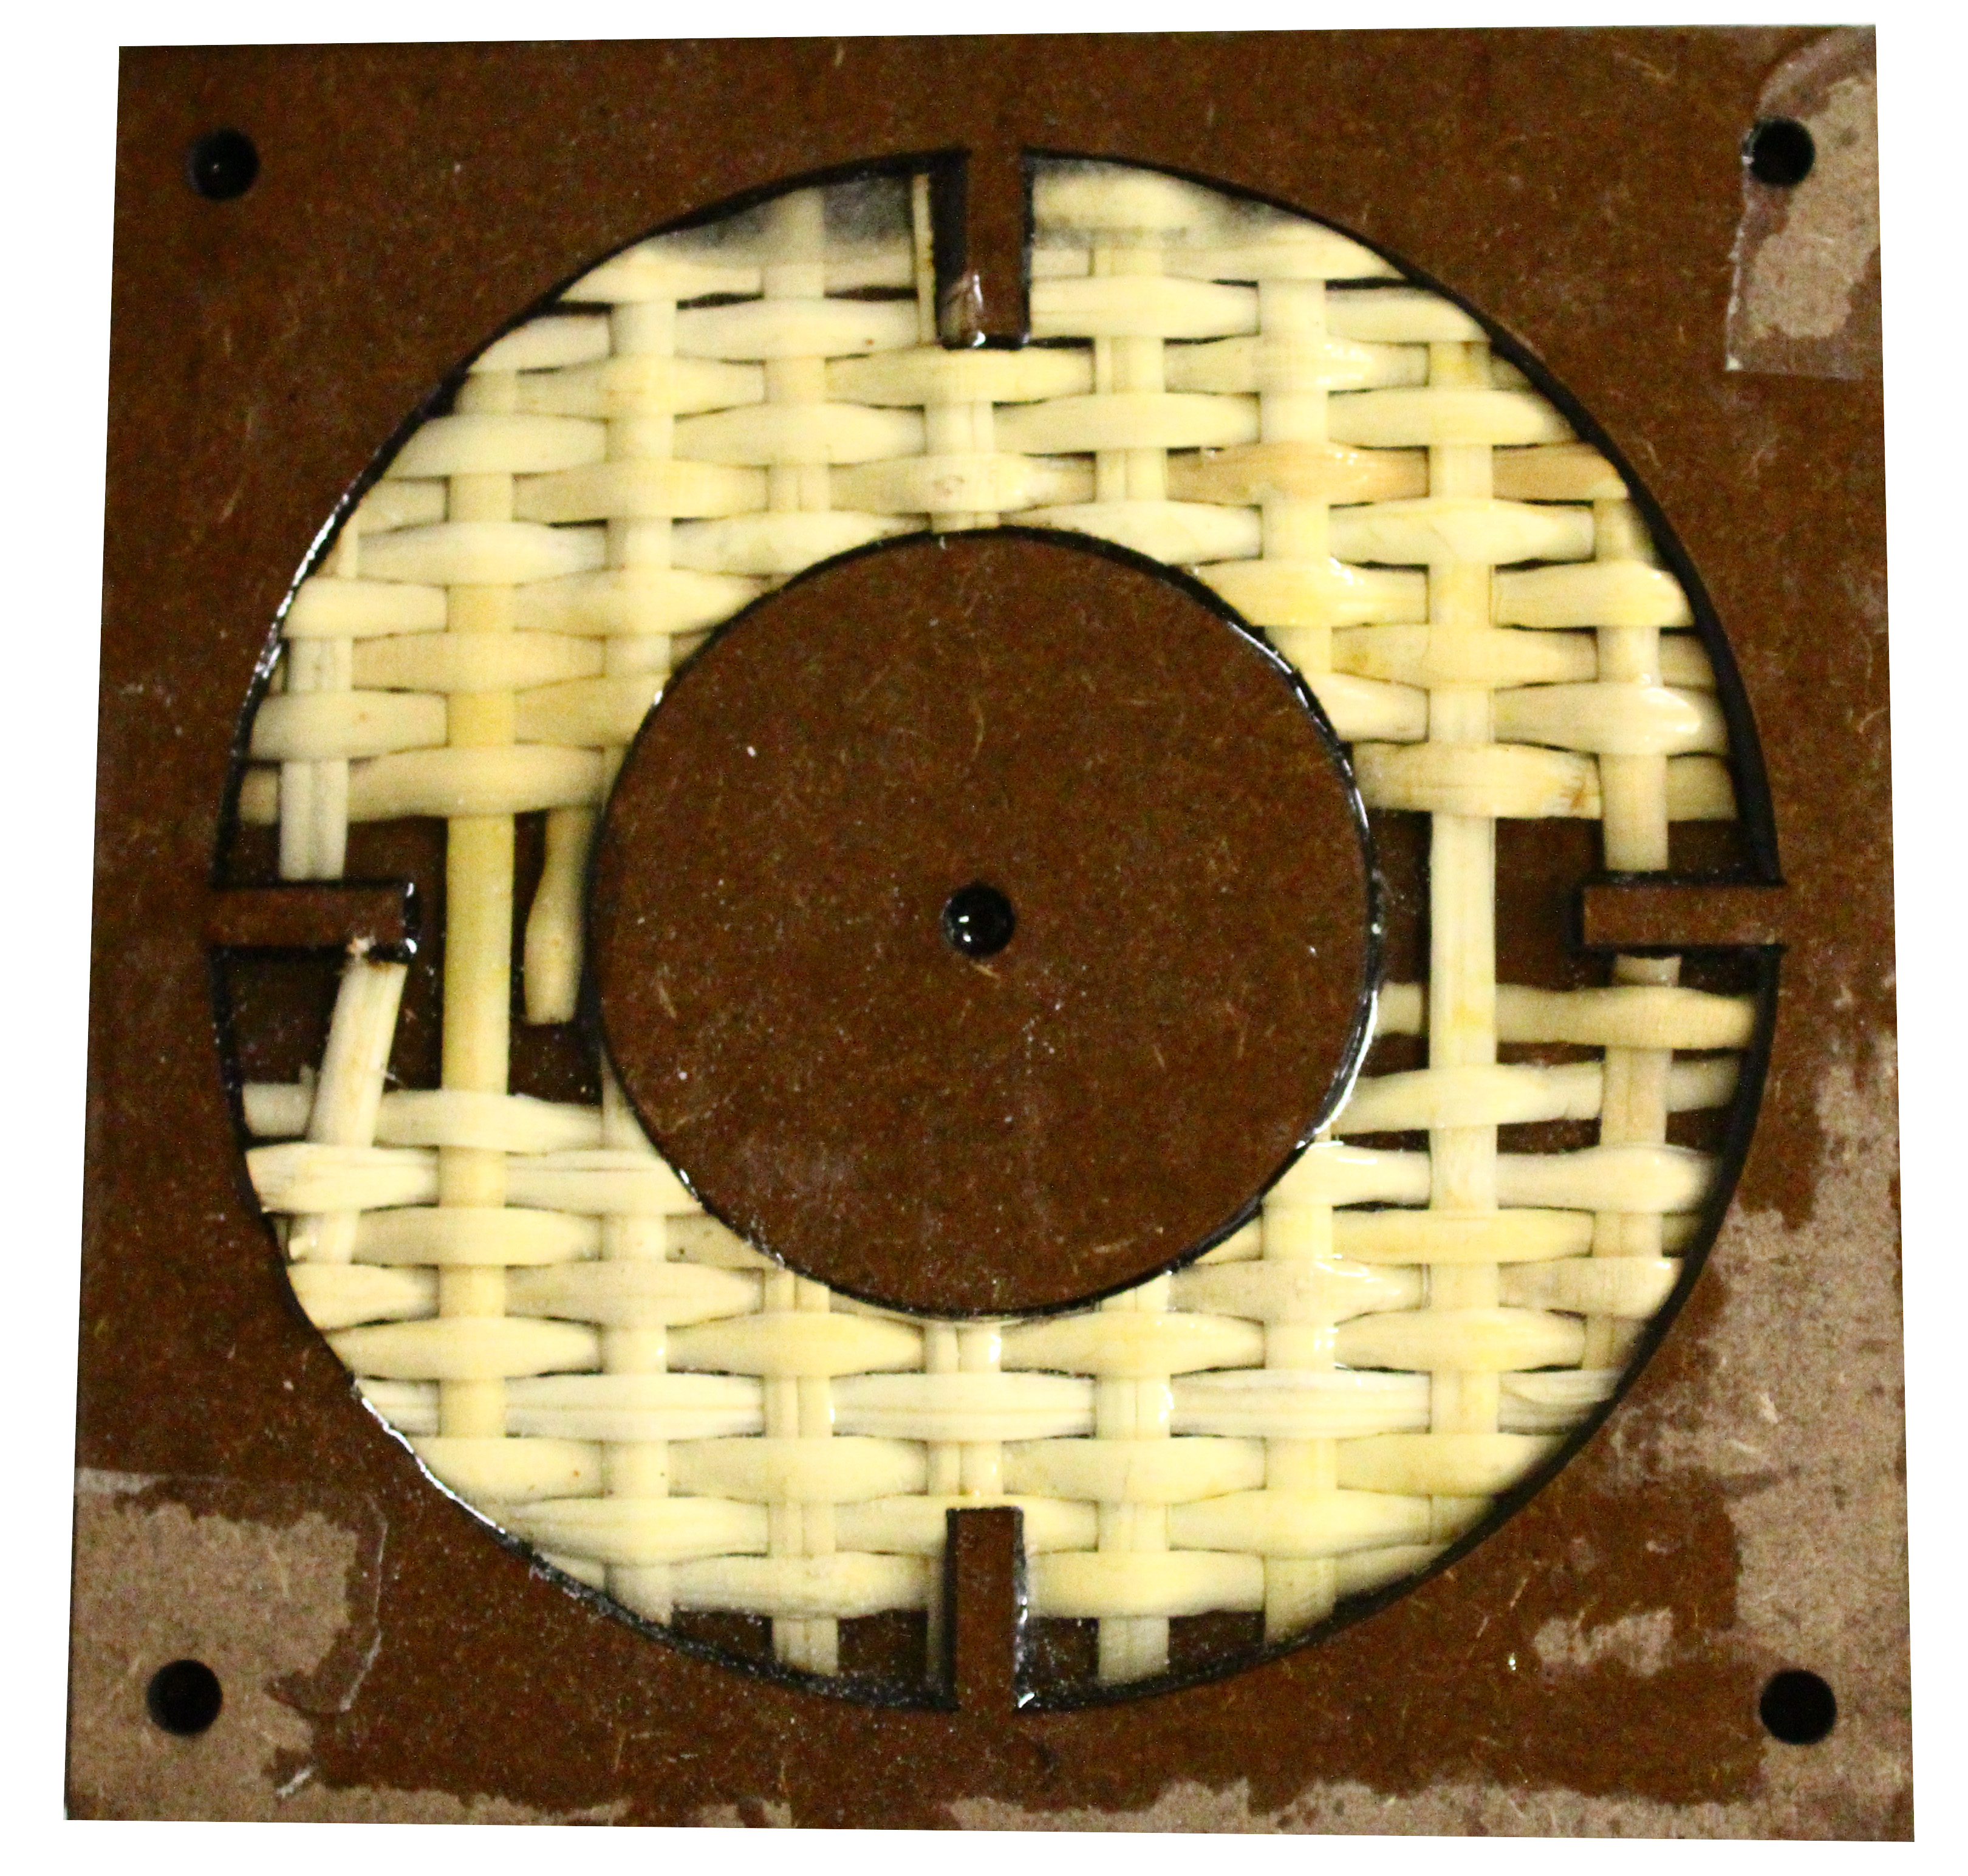 Liquid Plastic That Hardens : Laser cutting iaac